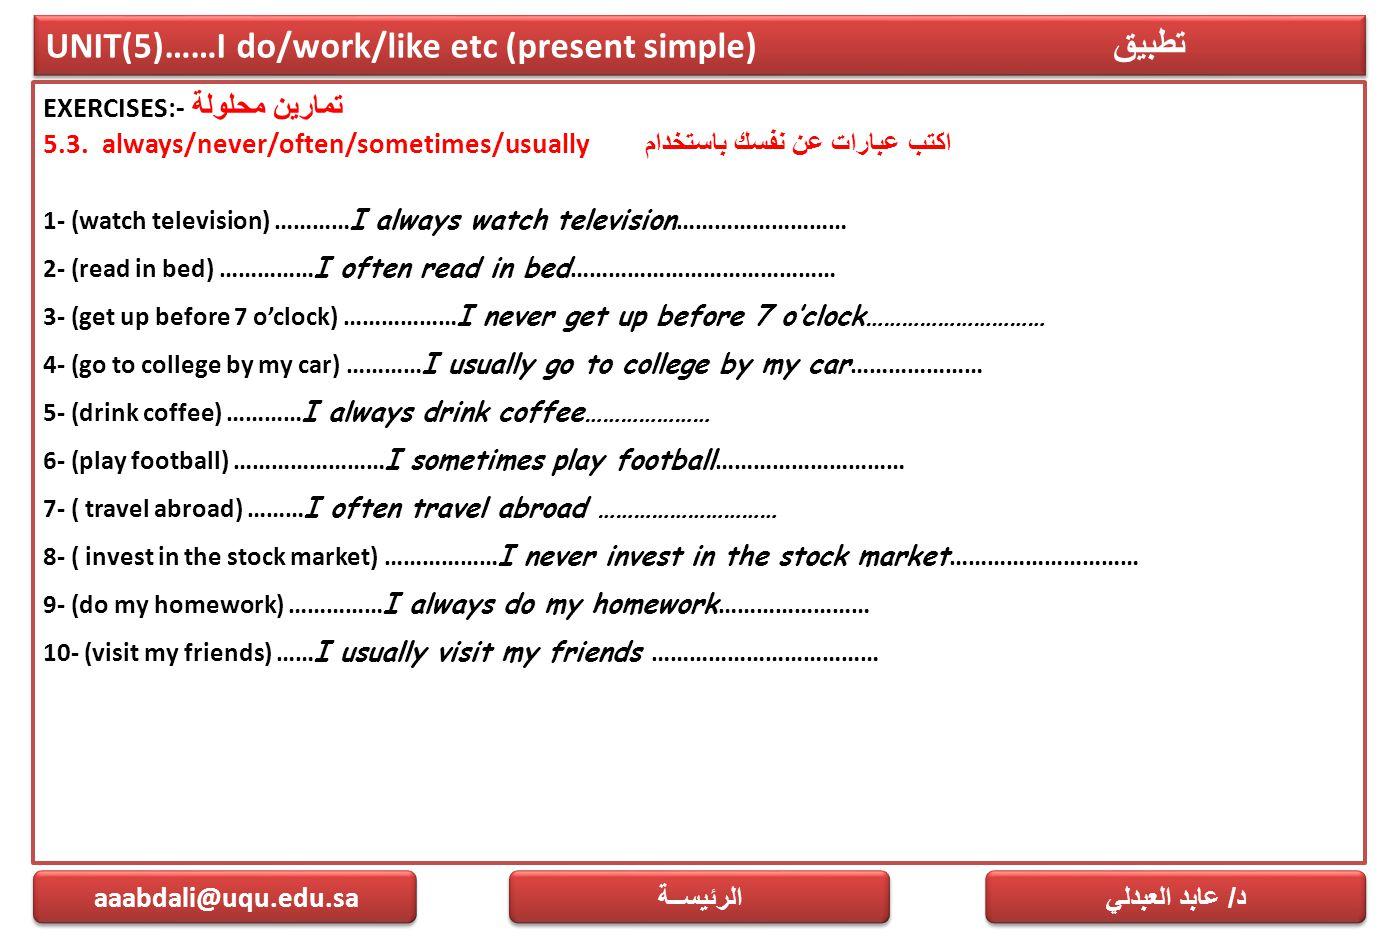 UNIT(5)……I do/work/like etc (present simple) تطبيق